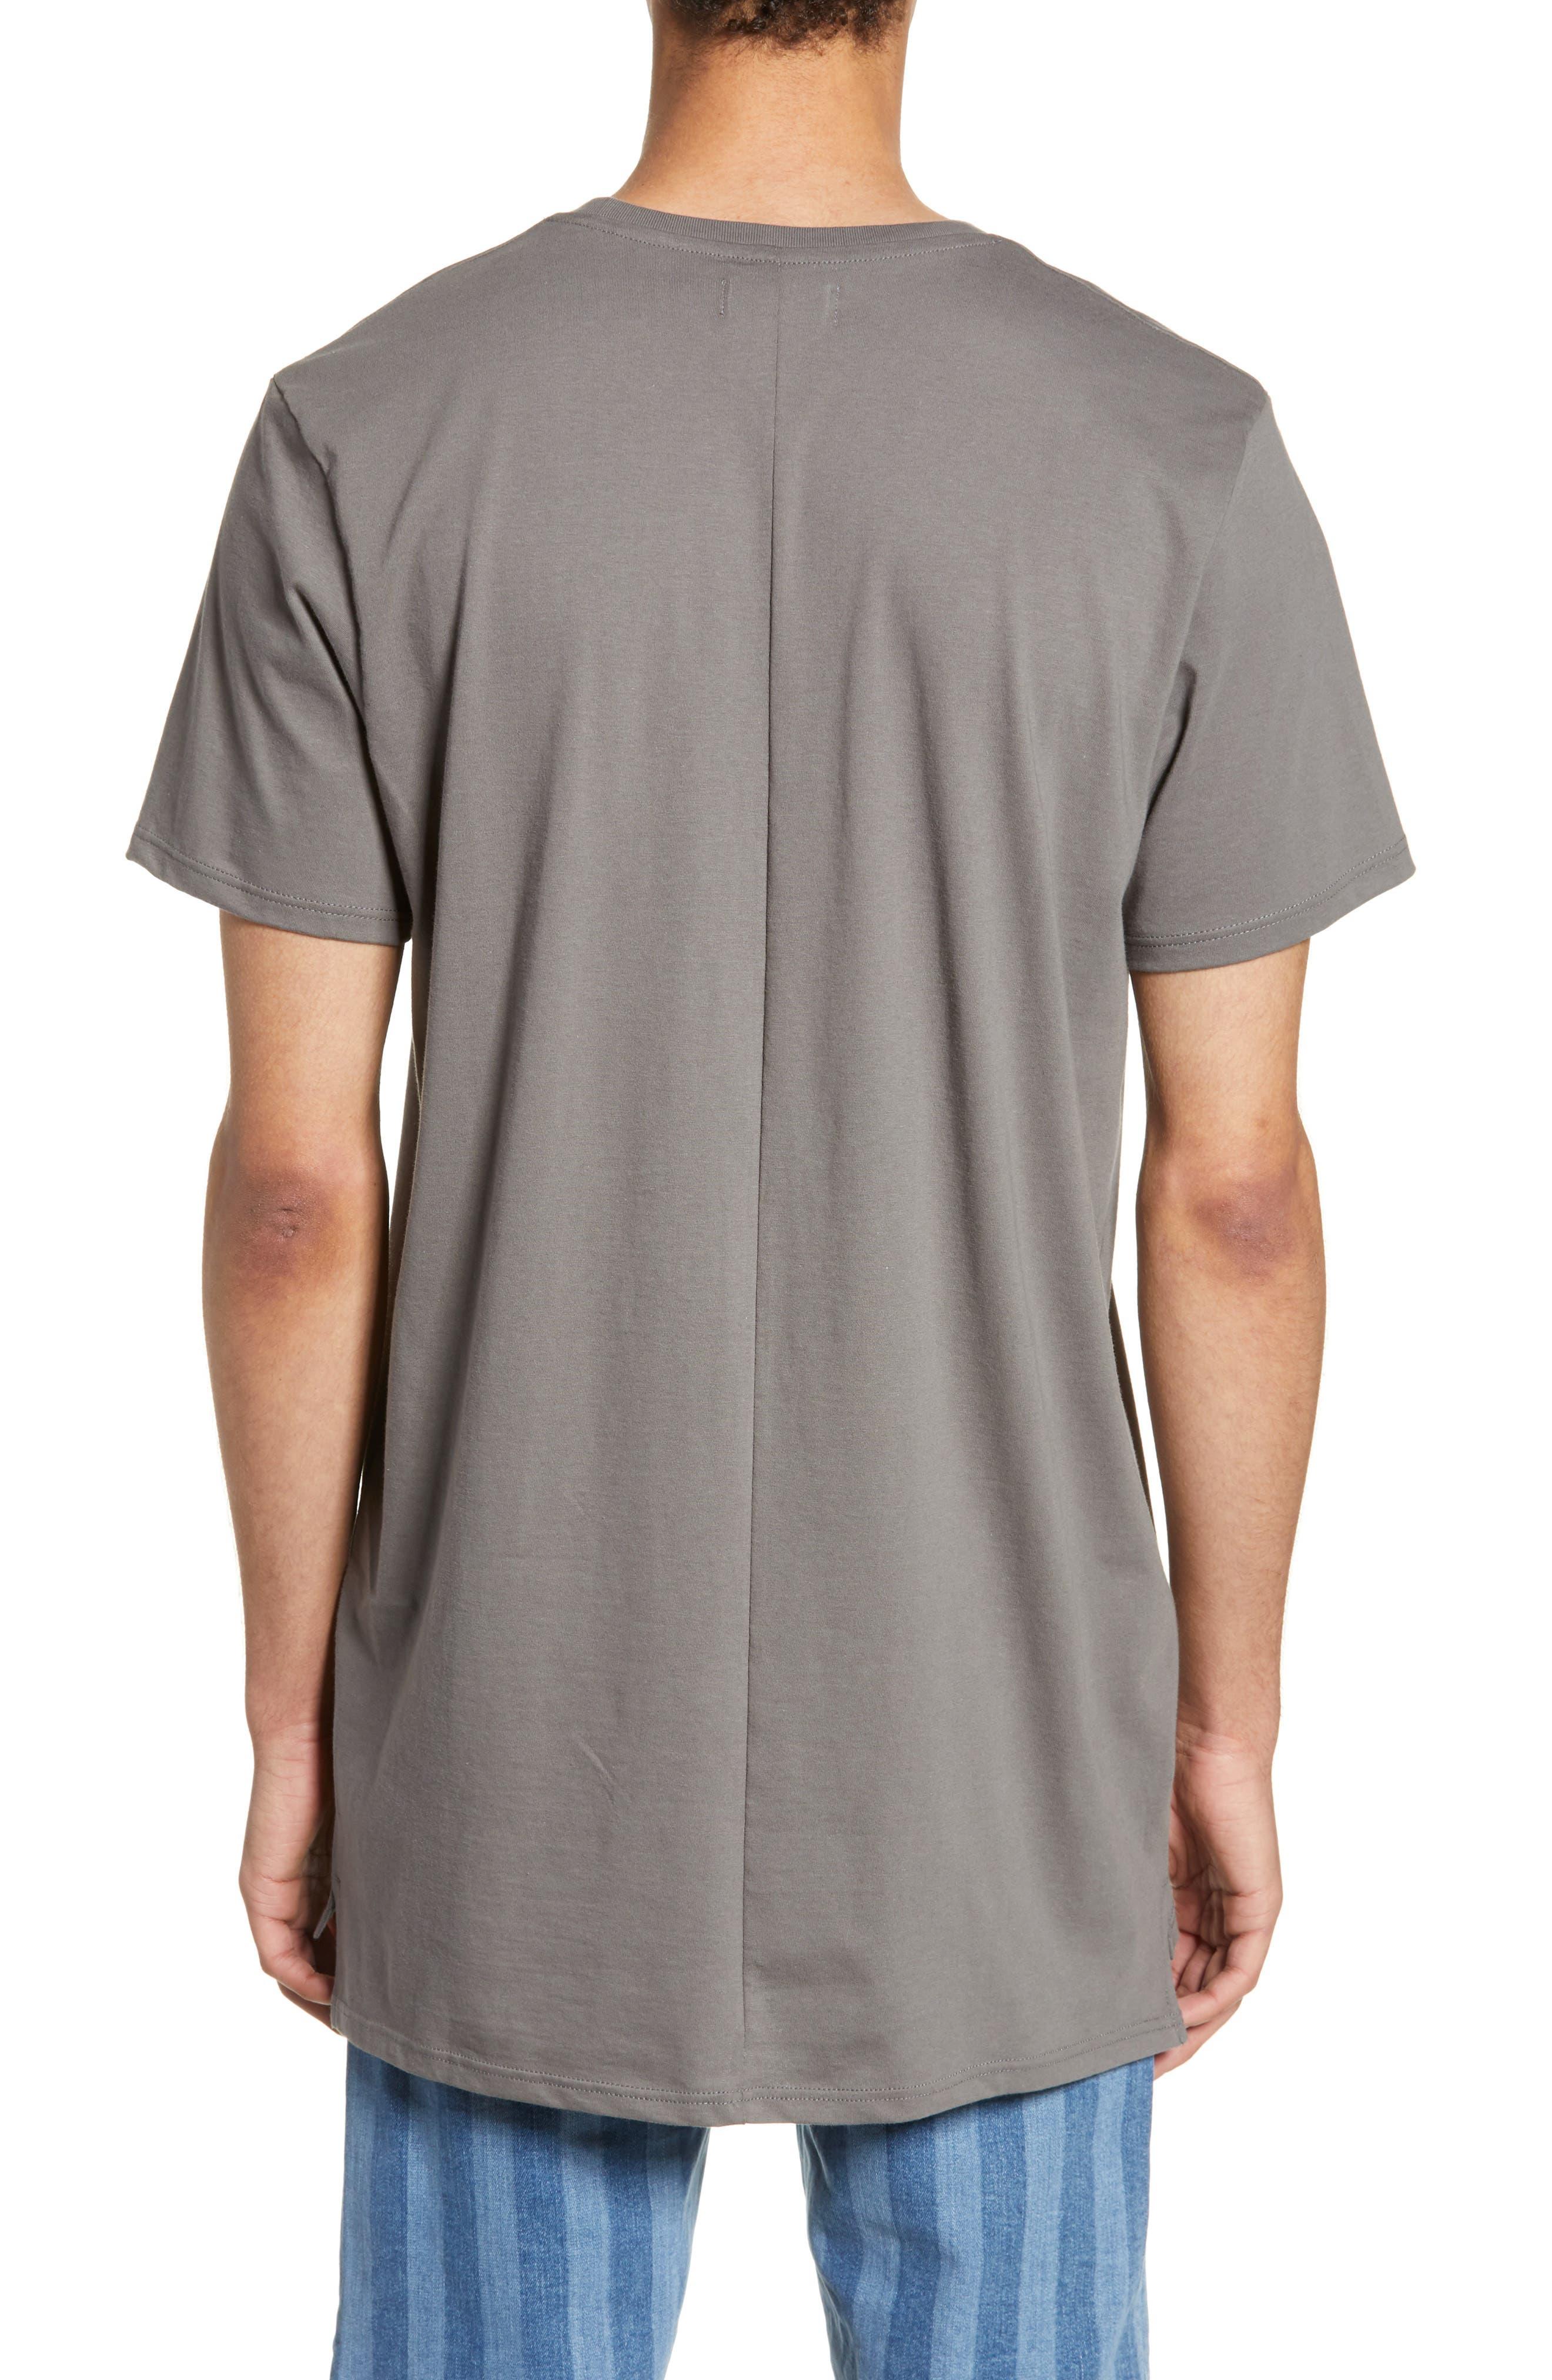 TOPMAN, Longline T-Shirt, Alternate thumbnail 2, color, GREY